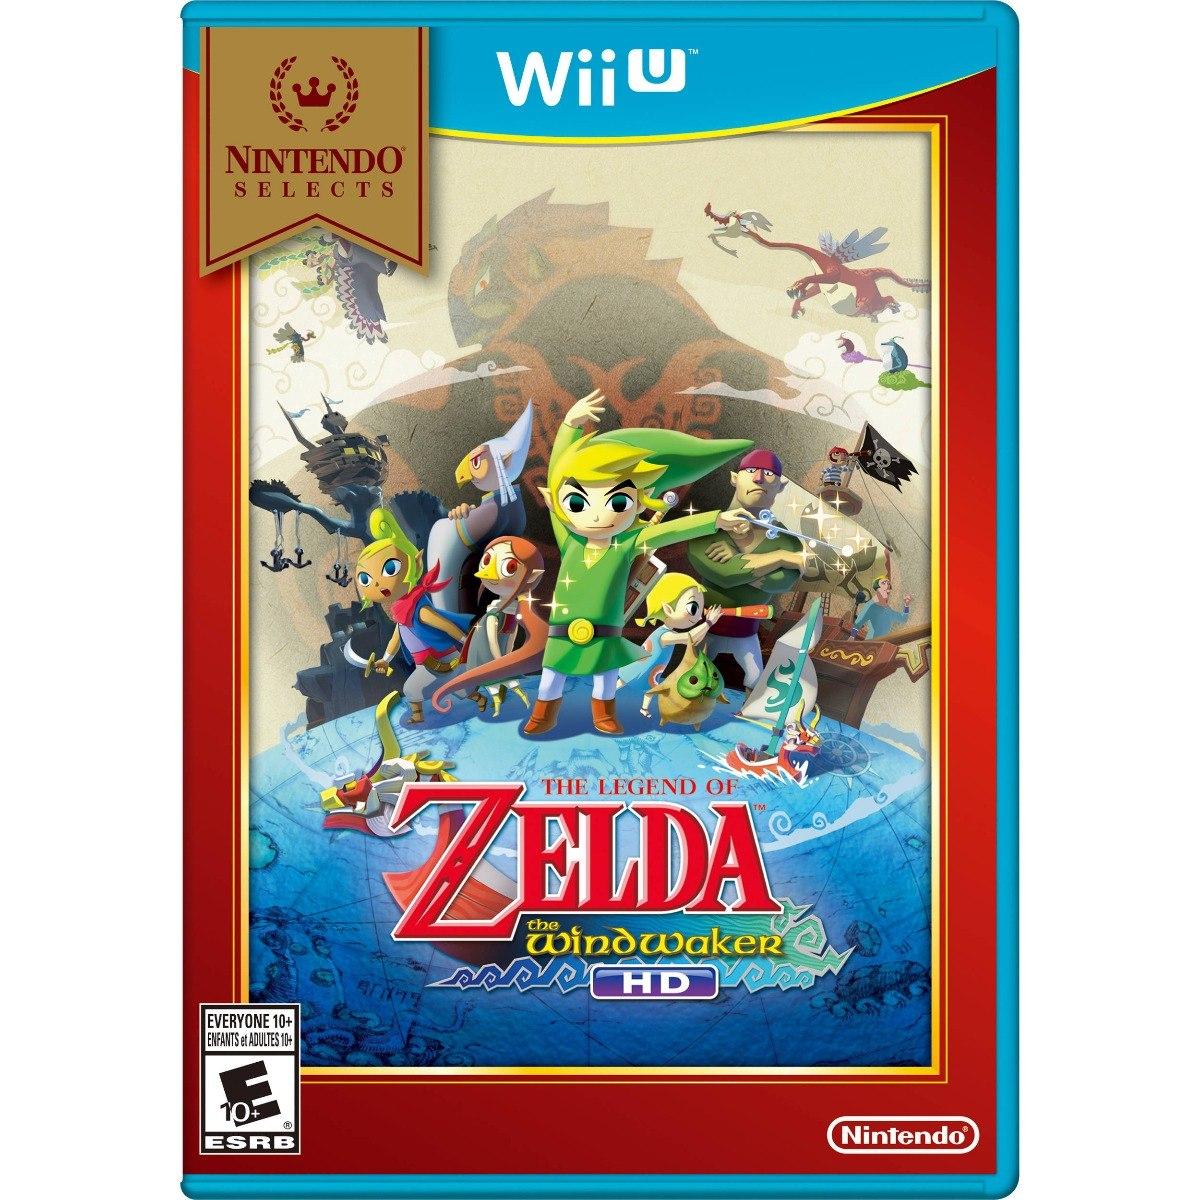 Juego The Legend Of Zelda The Wind Waker Para Wii U Nuevo 1 115